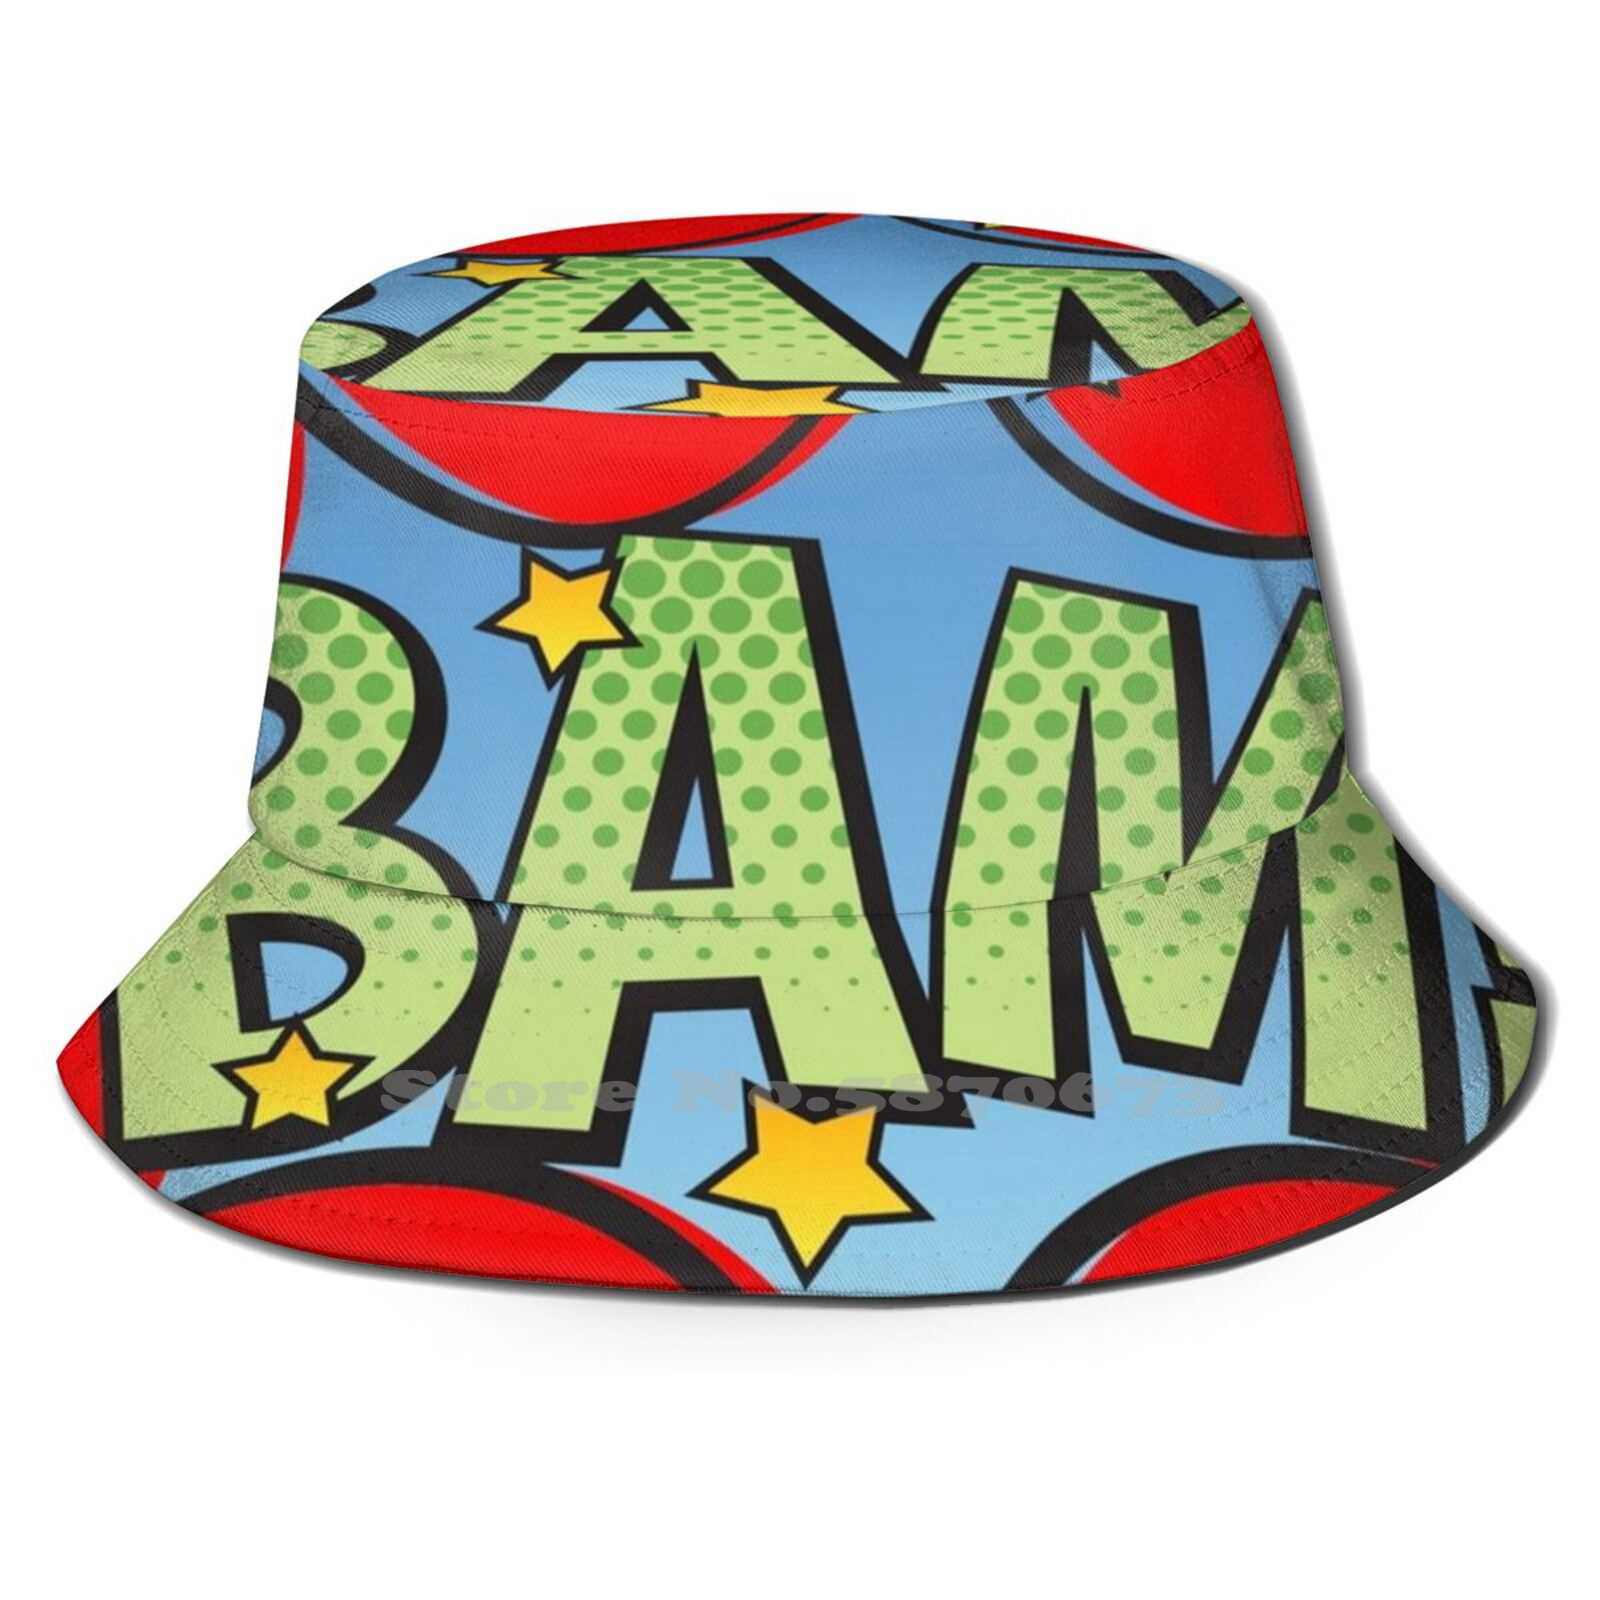 Bam! Outdoor Sun Fishing Panama Hats Cosplay Love Friend Superhero Shazam Dark Horse Ironman Incredibles Cartoon Cloud Rain